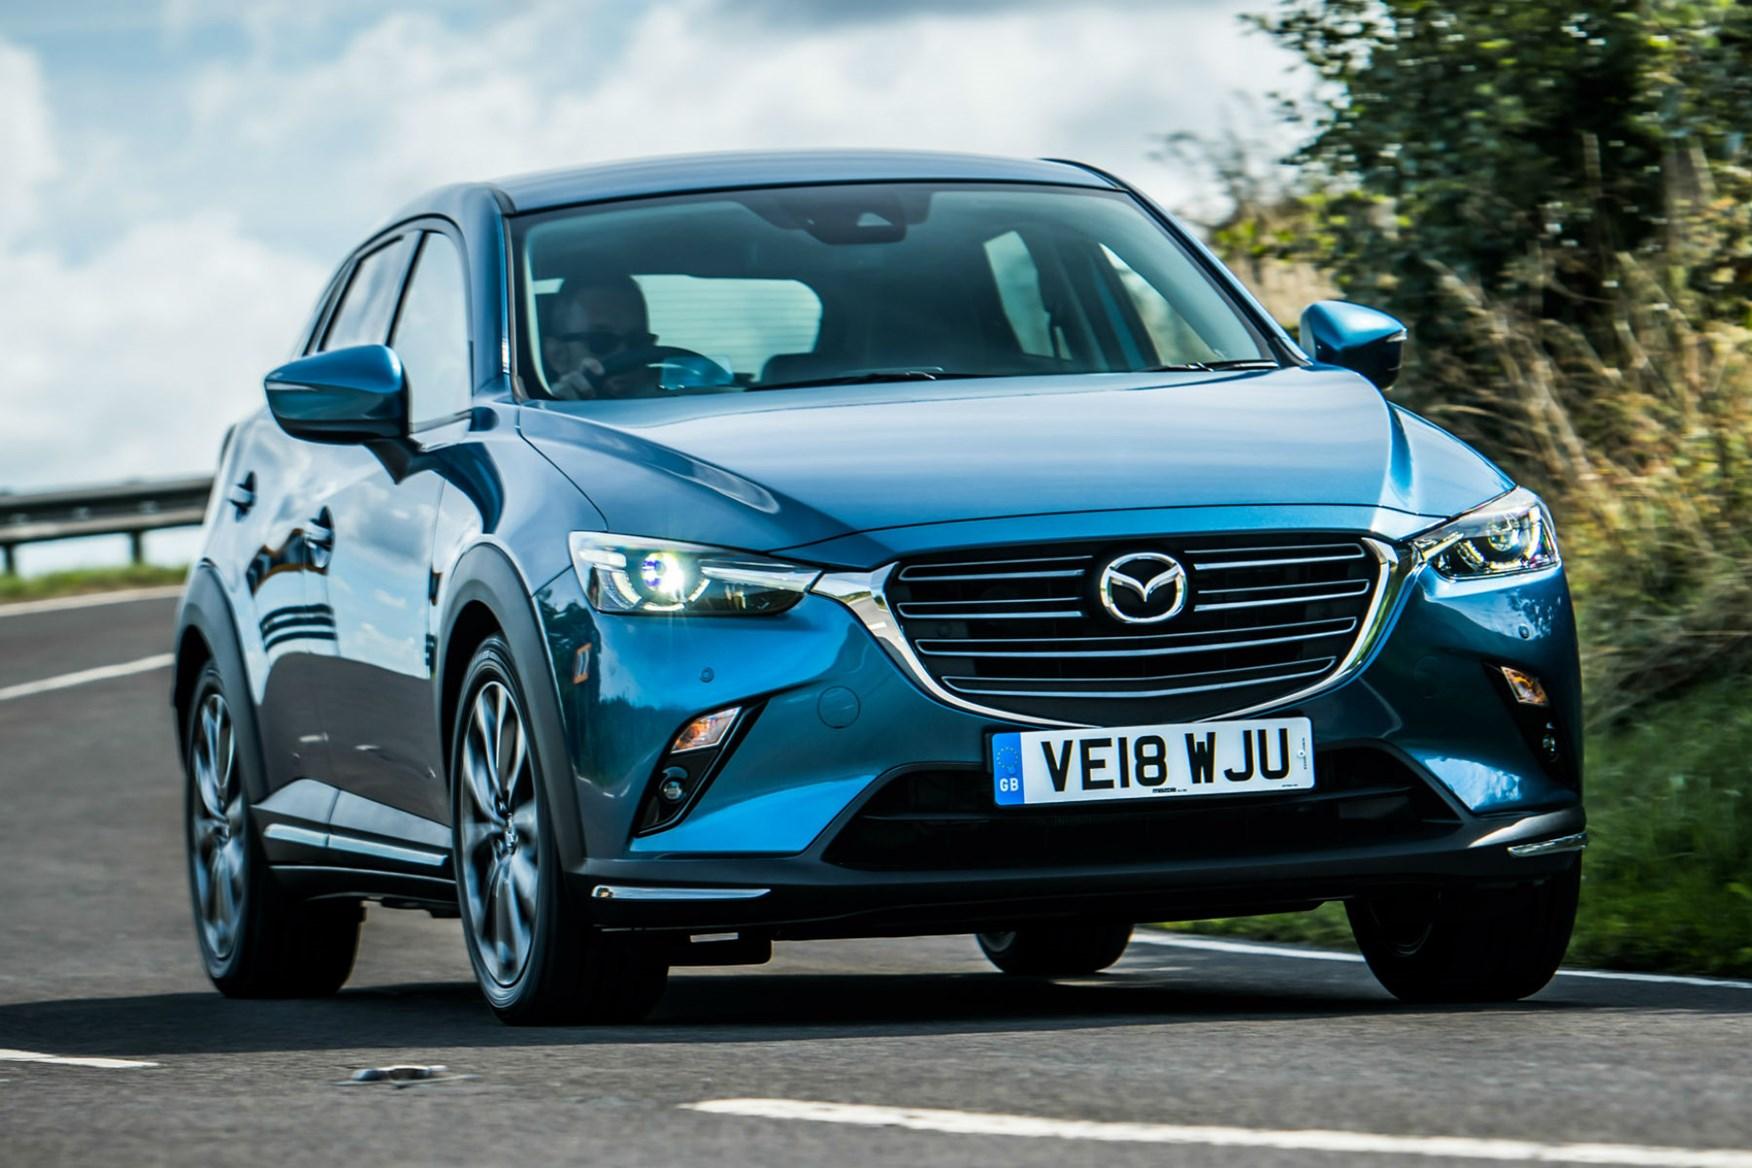 Toyota Rav4 Lease >> Car finance: best new car deals for less than £200 per